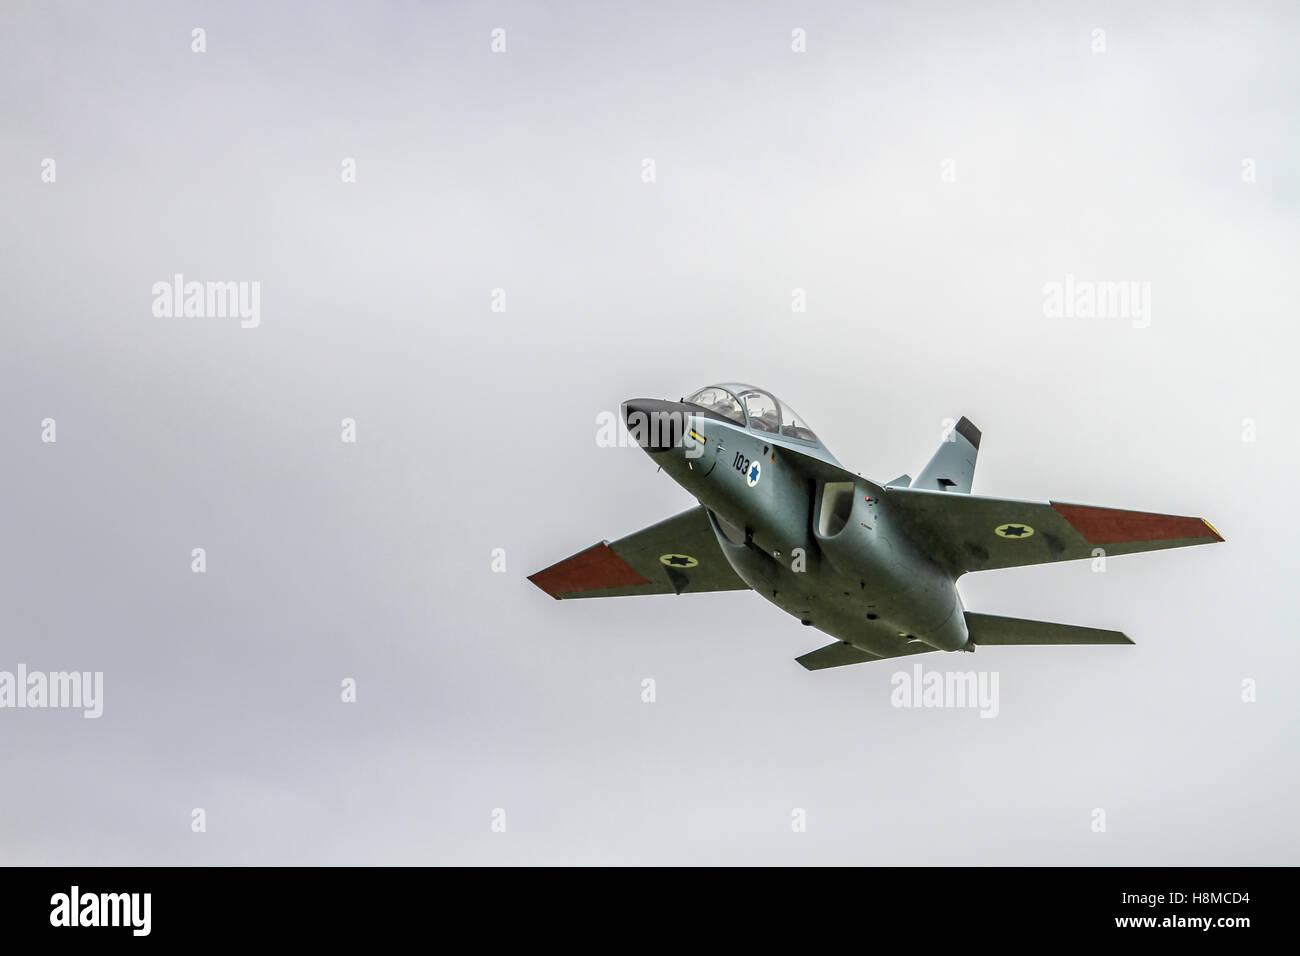 Israeli Air Force Alenia Aermacchi M-346 Master (IAF Lavi) a military twin-engine transonic trainer aircraft. - Stock Image